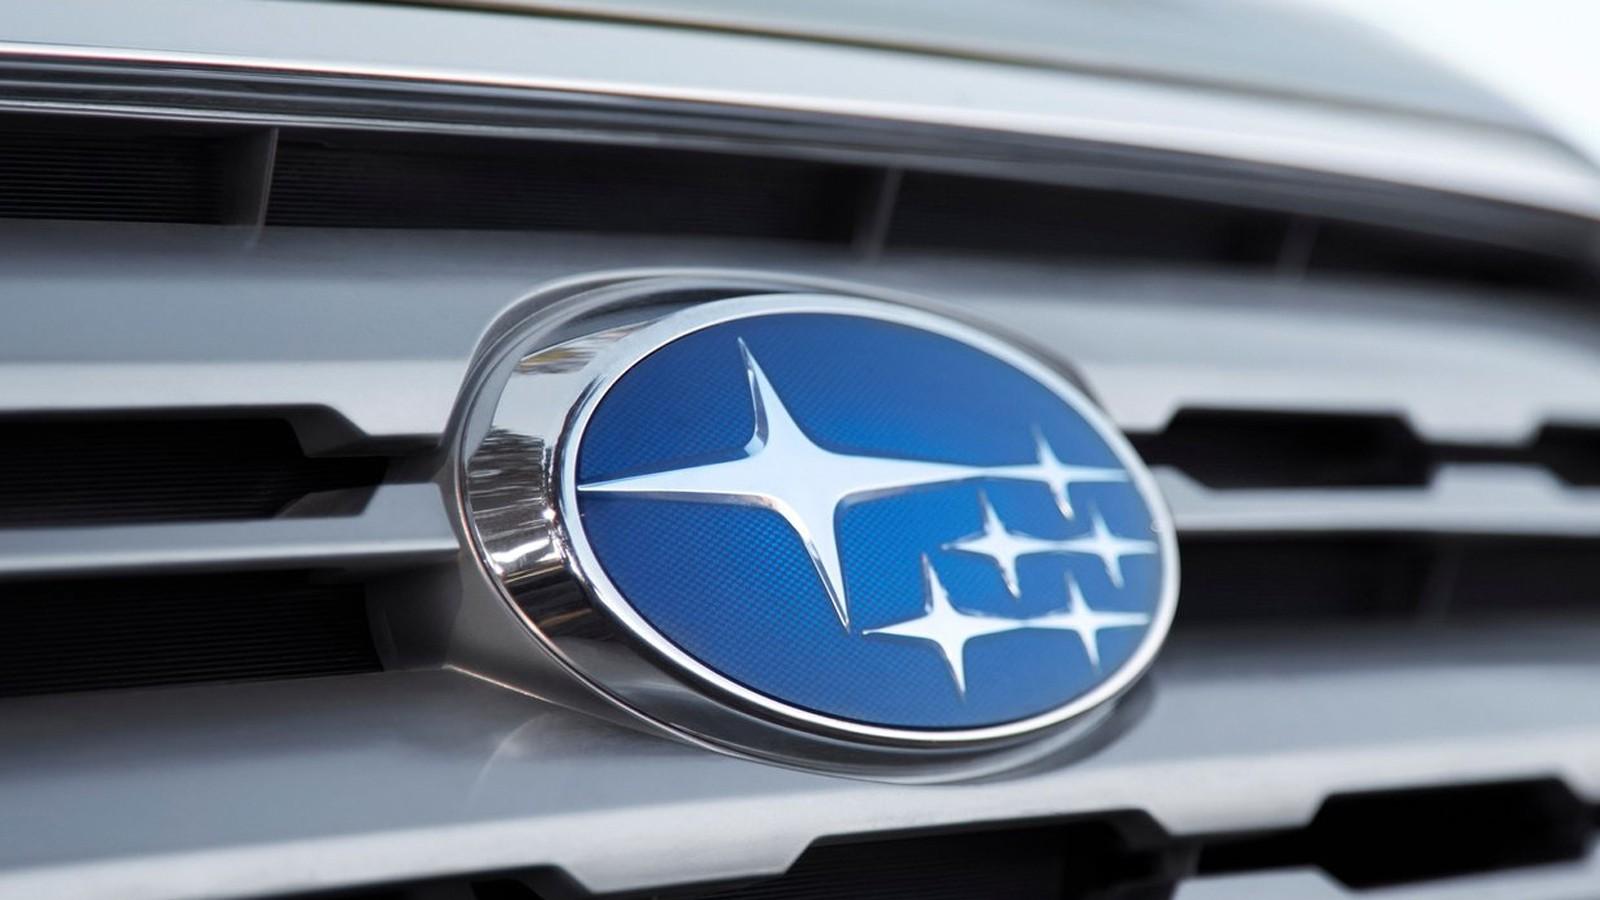 Subaru-Outback-2015-1600-3a